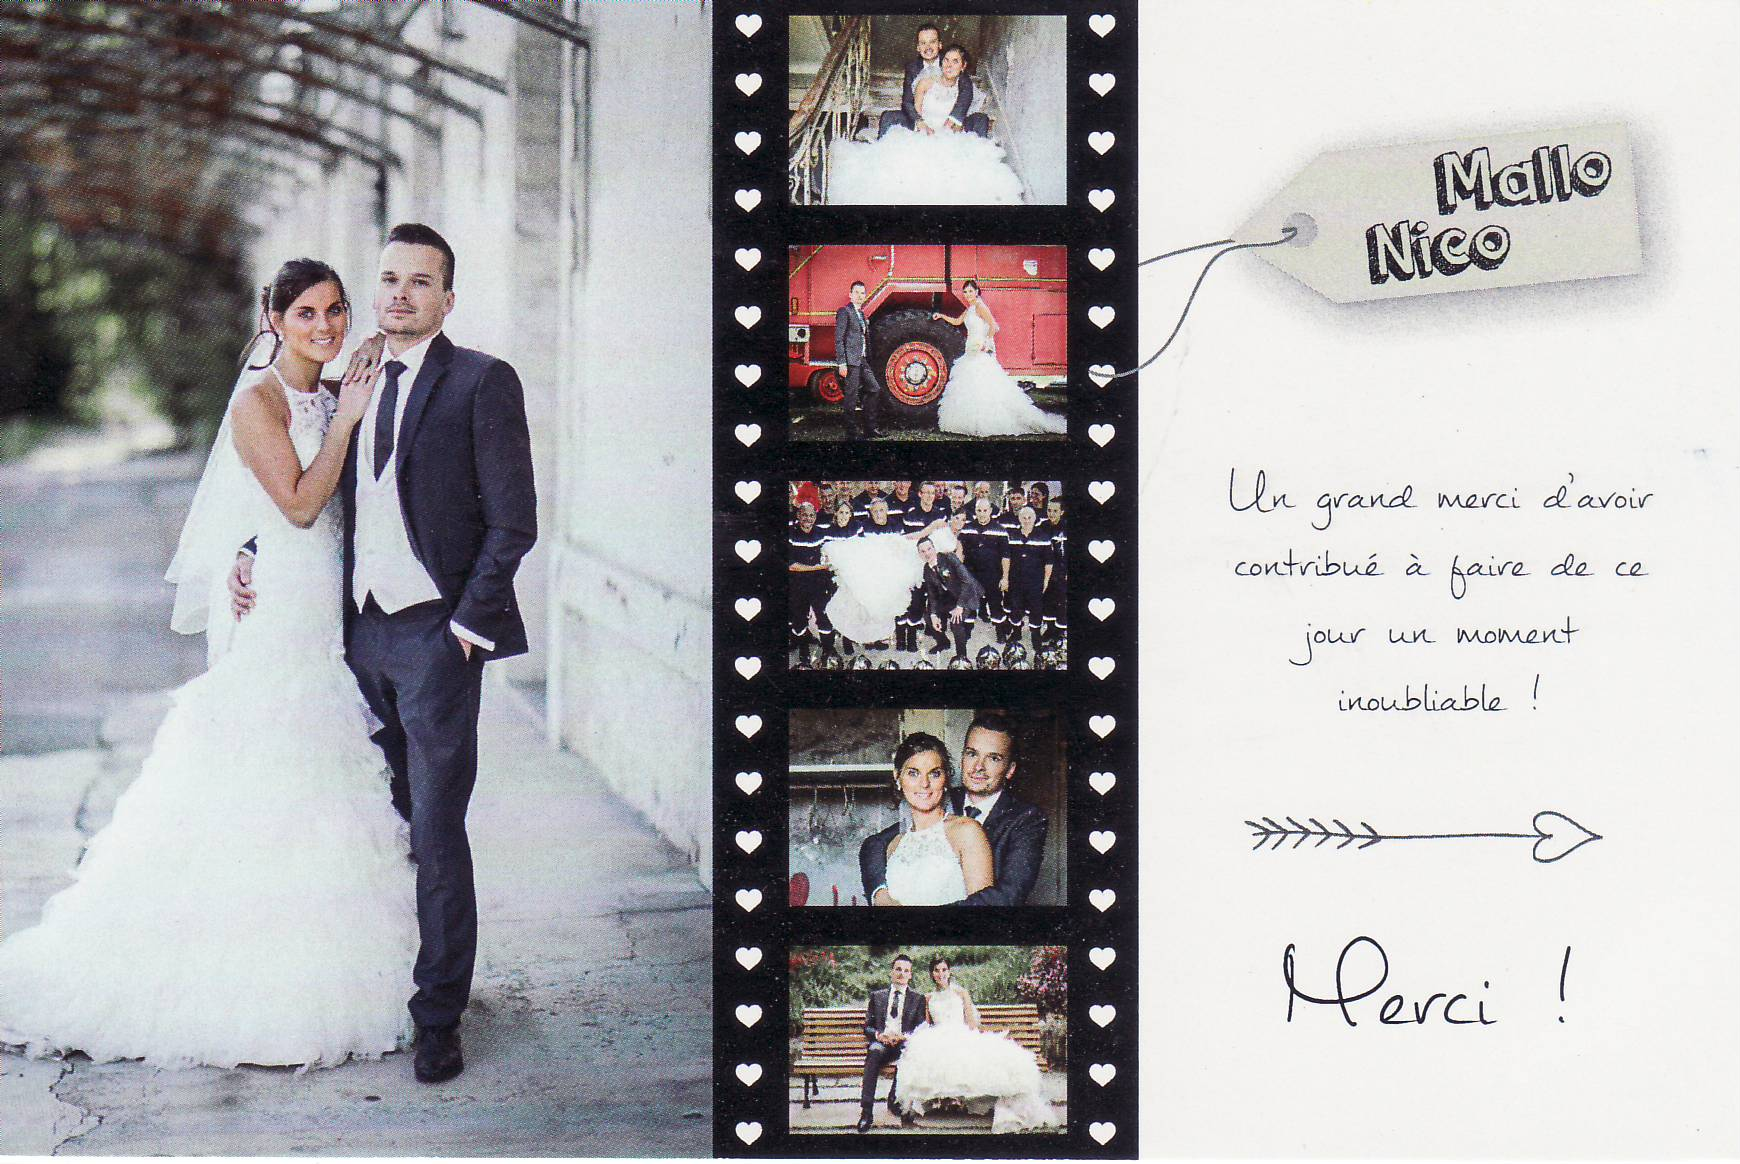 Mariage FOLLET Nicolas & Mallorye (Domaine de Divonne) (06-09-2014) 1.JPG